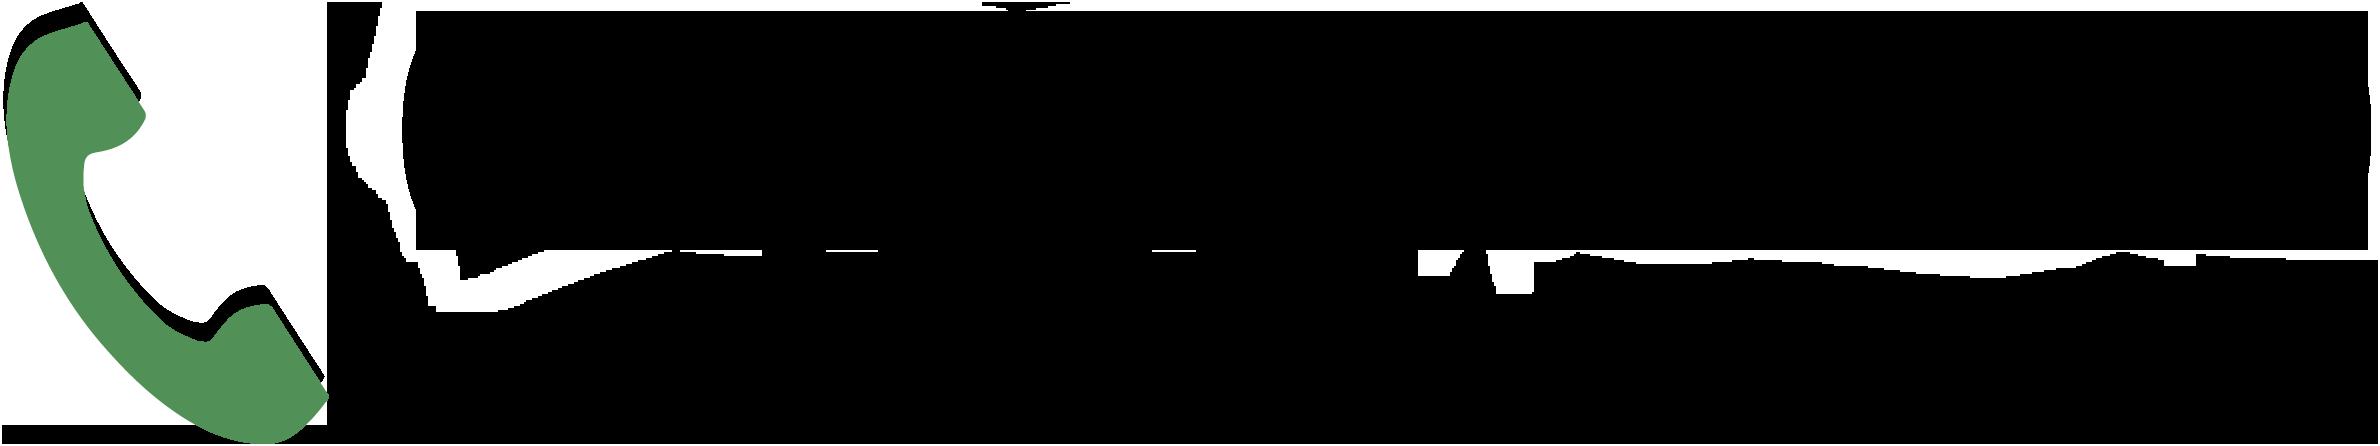 055-957-1300